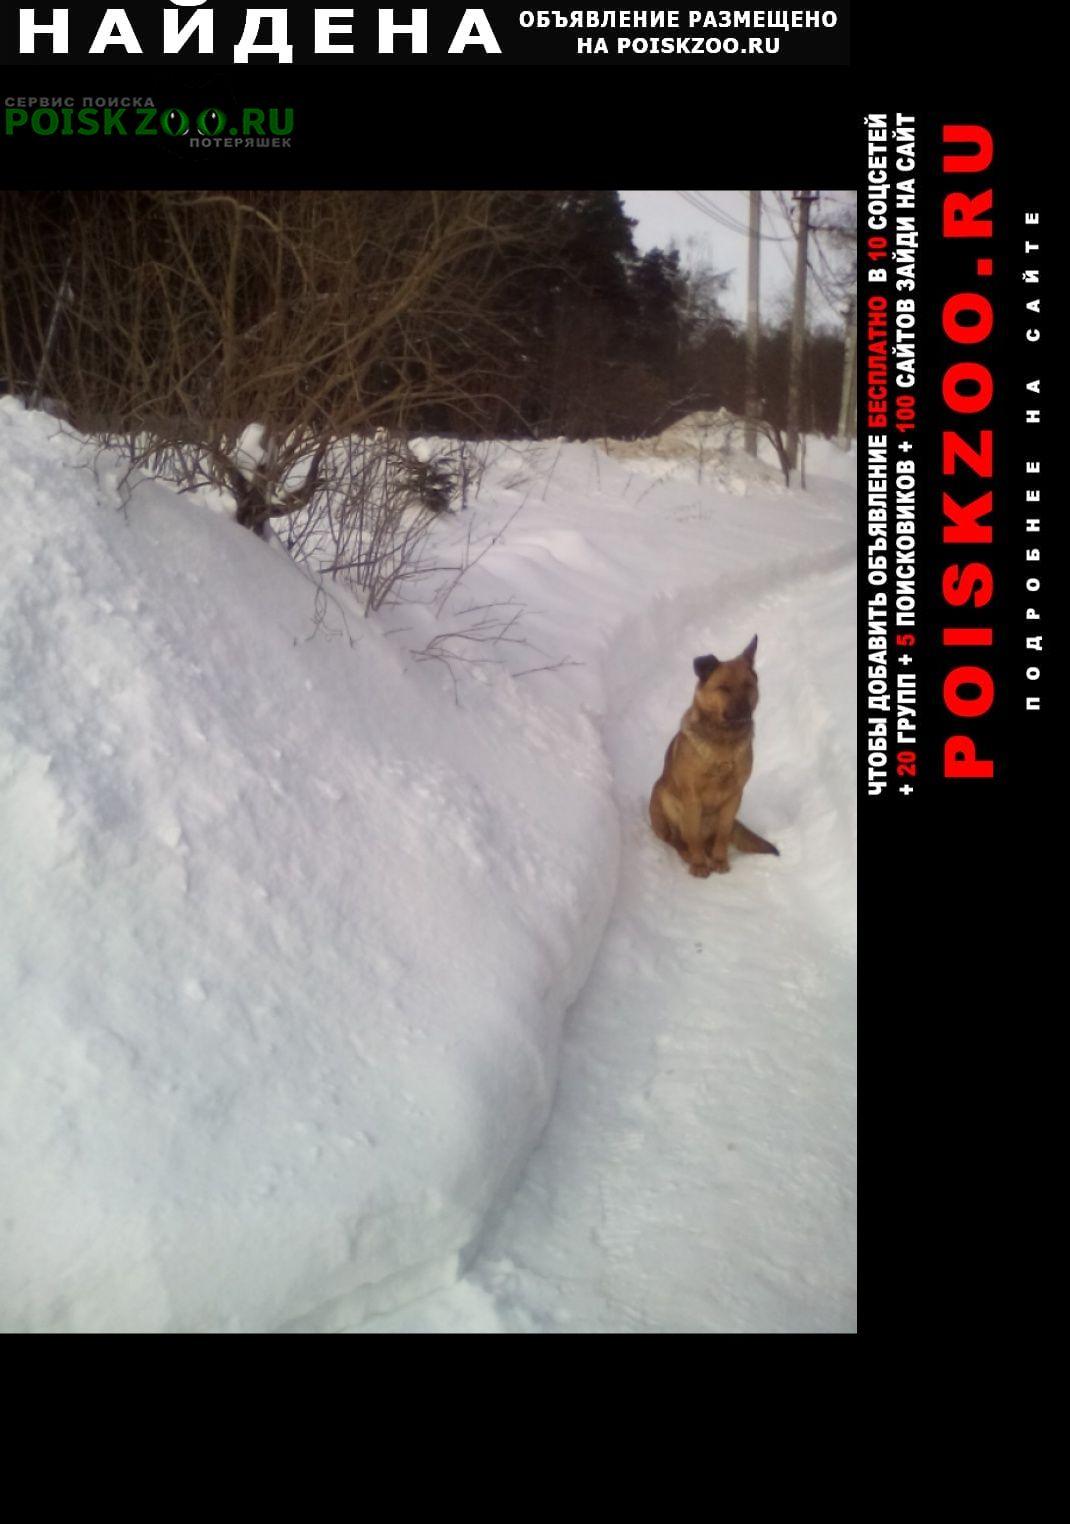 Найдена собака Малаховка